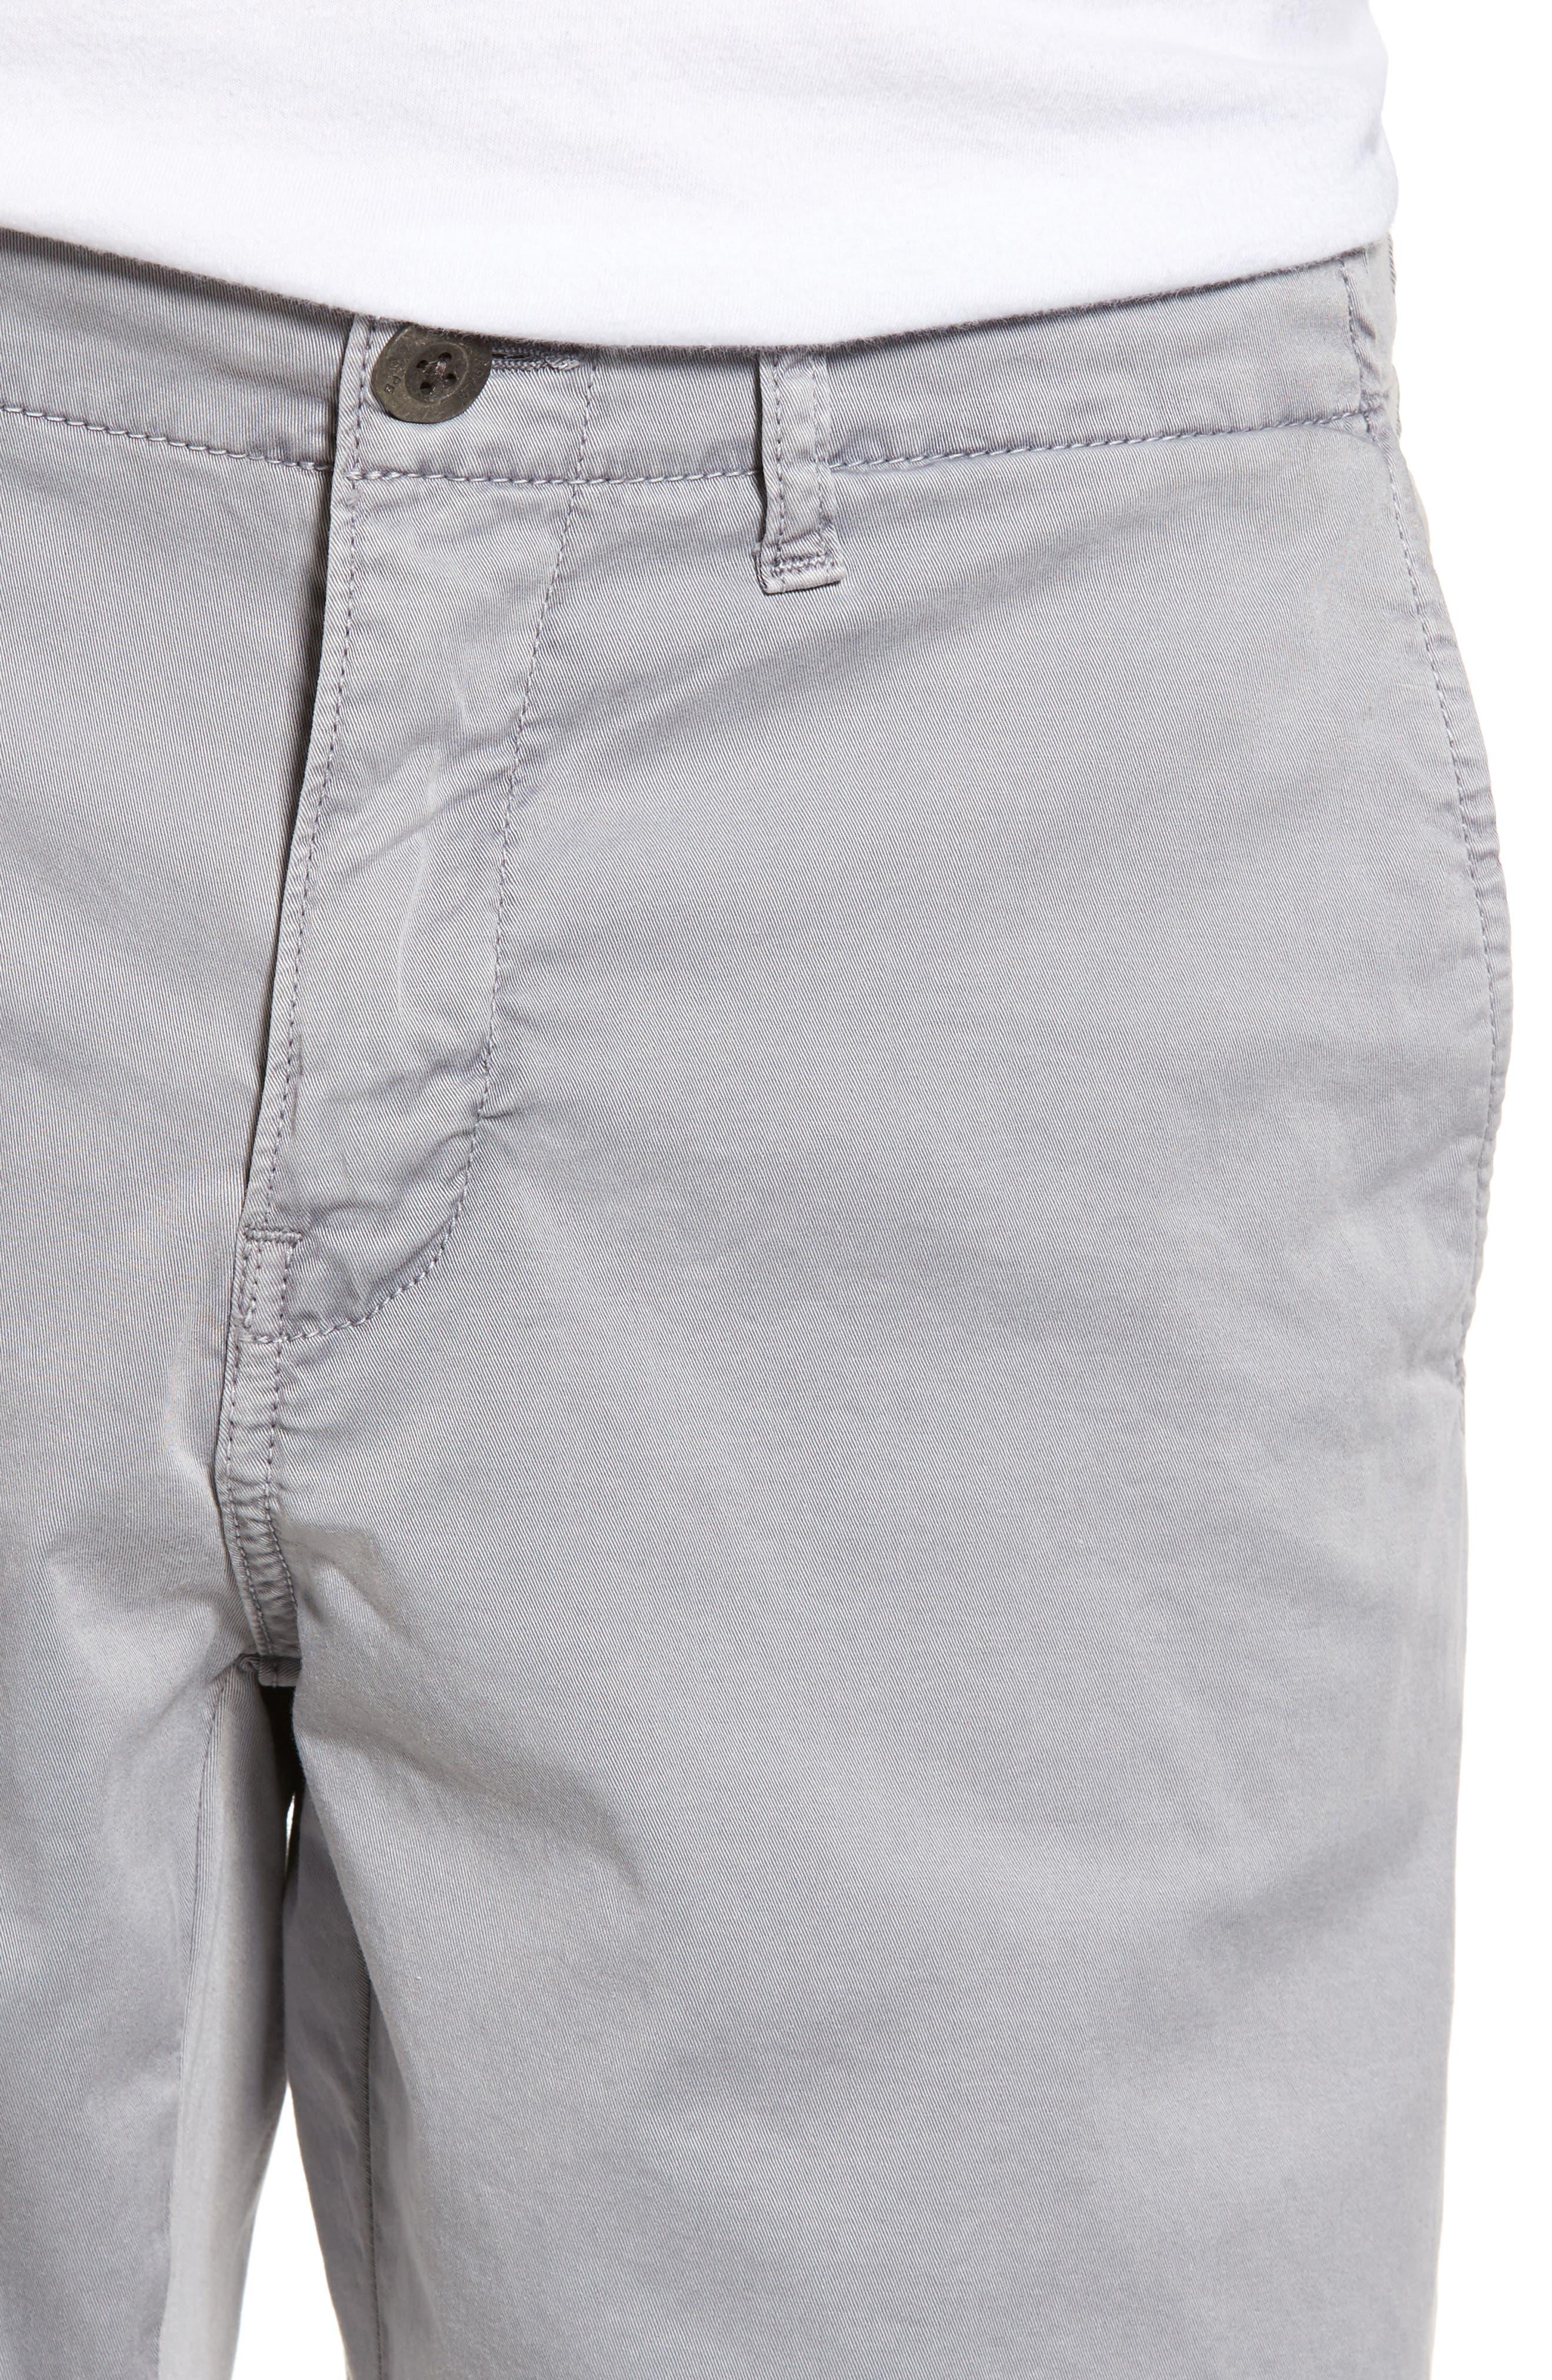 St. Barts Twill Shorts,                             Alternate thumbnail 39, color,